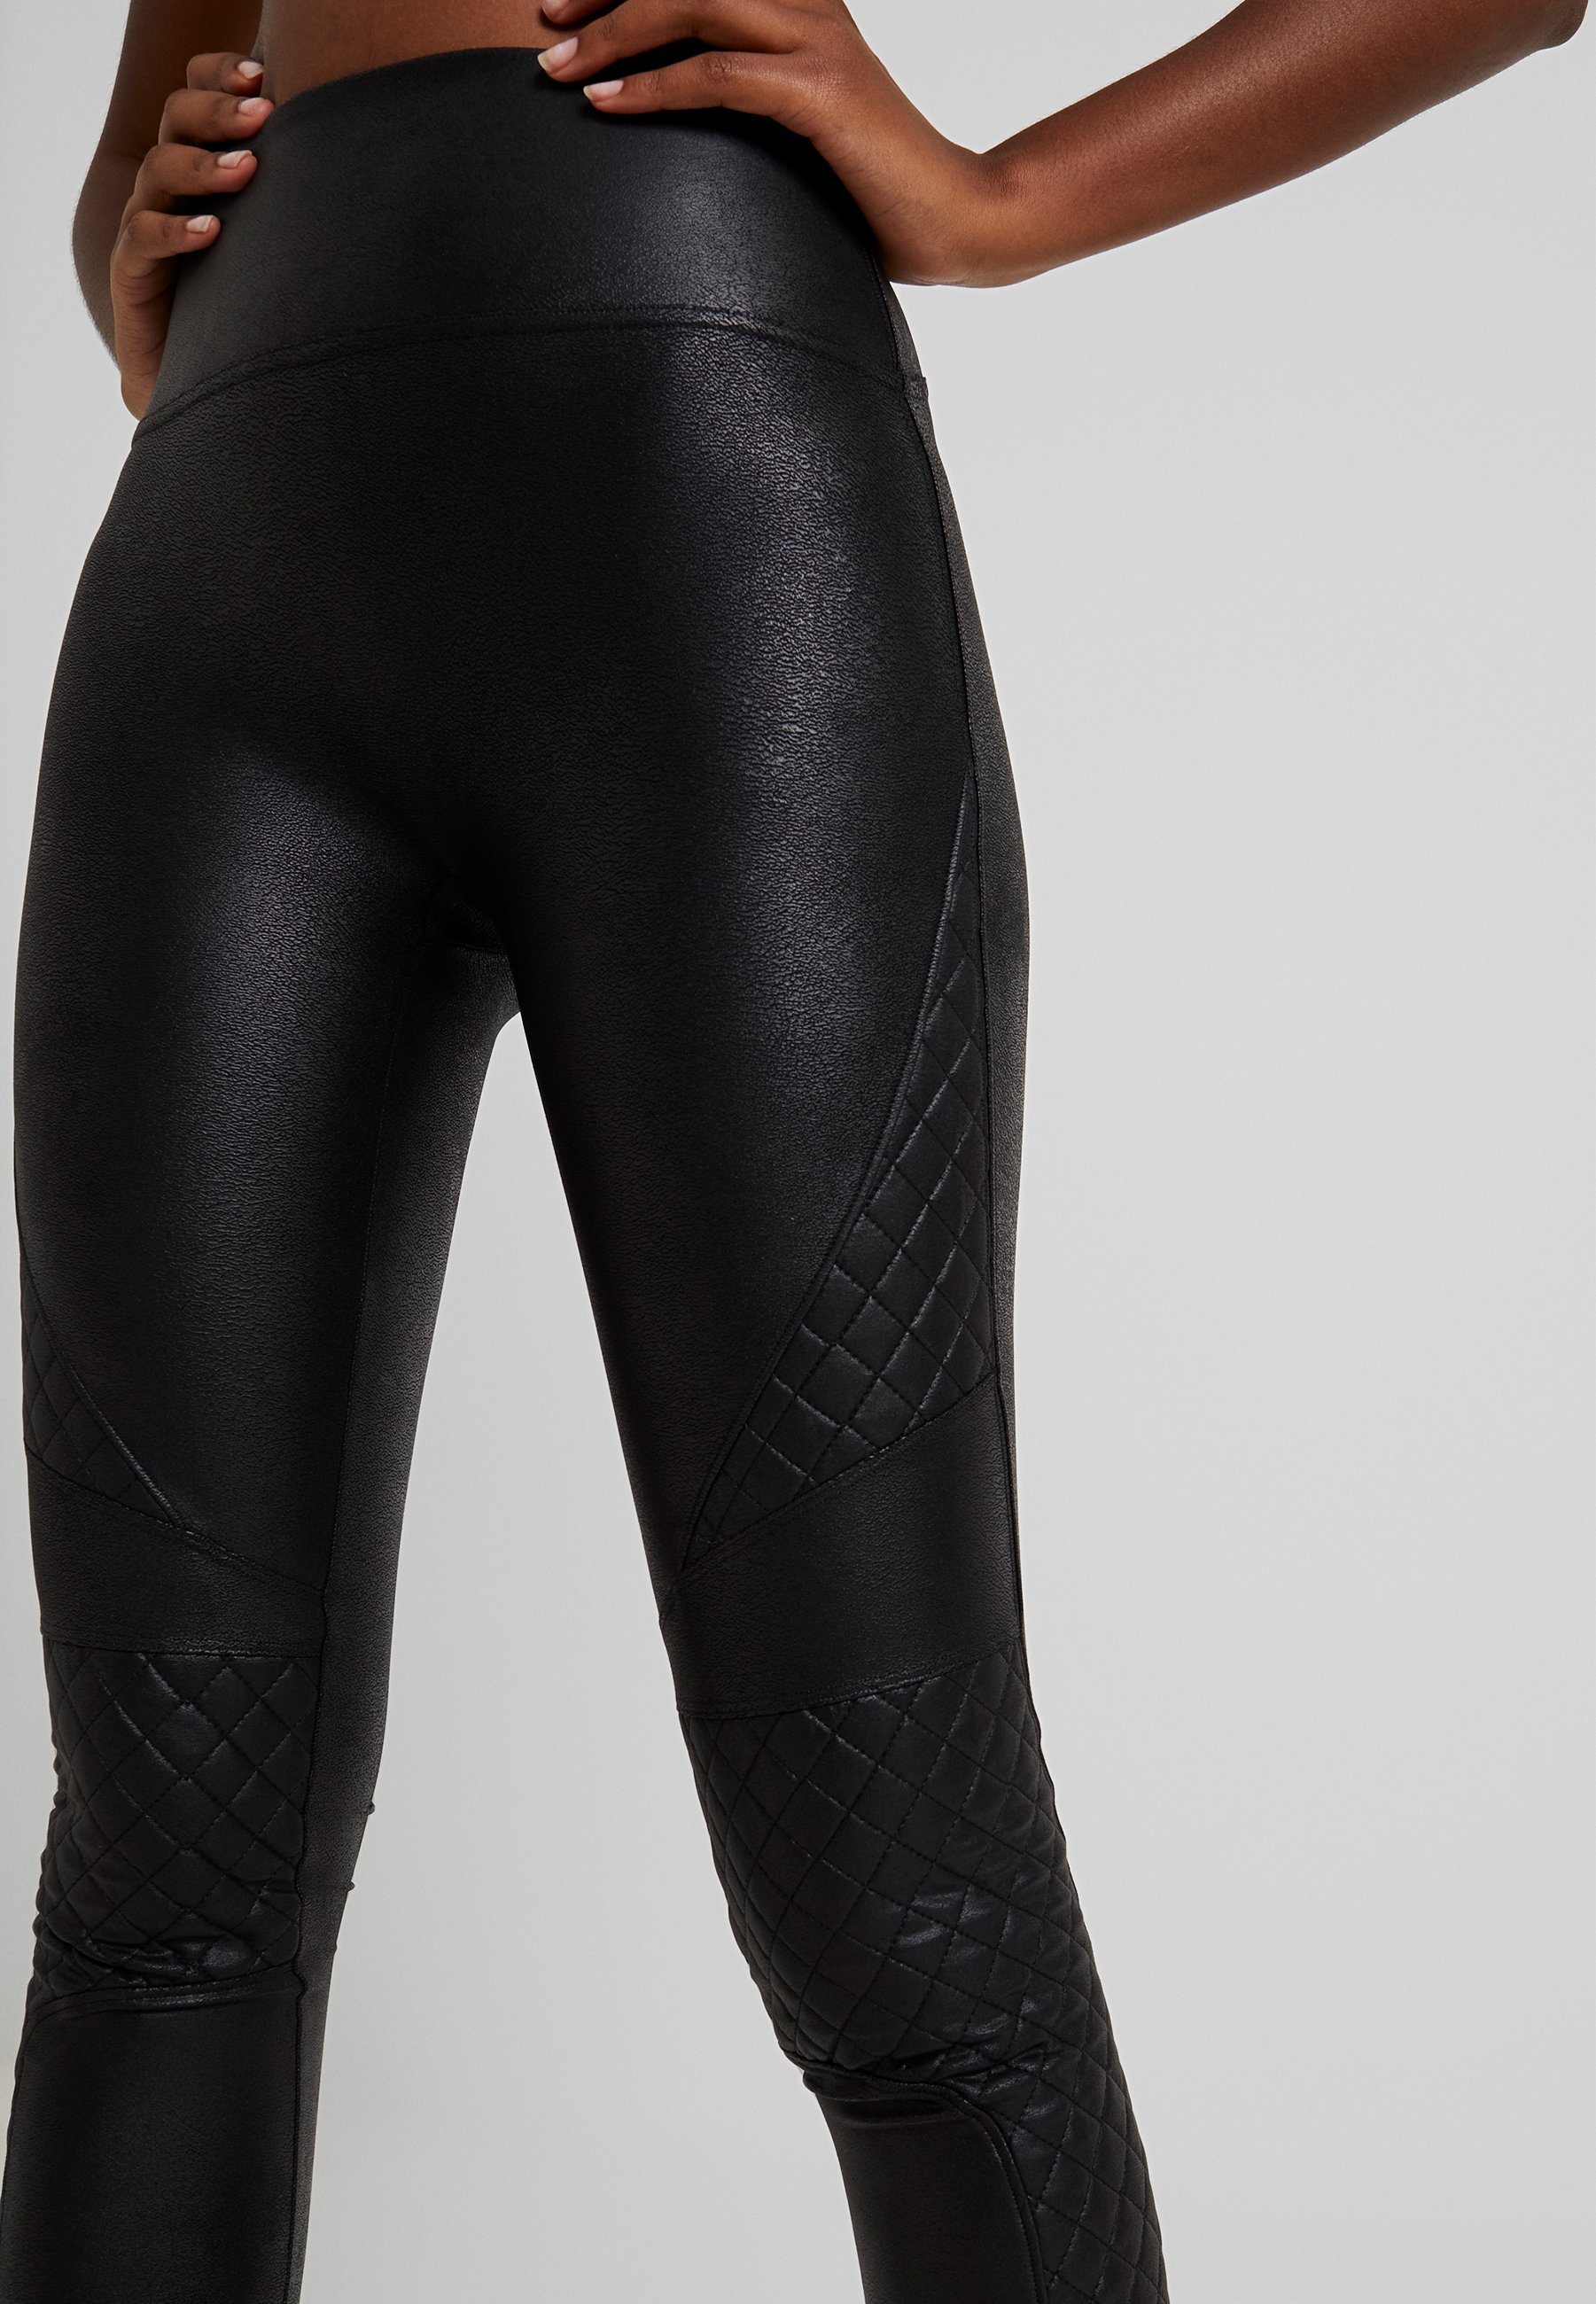 Women QUILTED - Leggings - Stockings